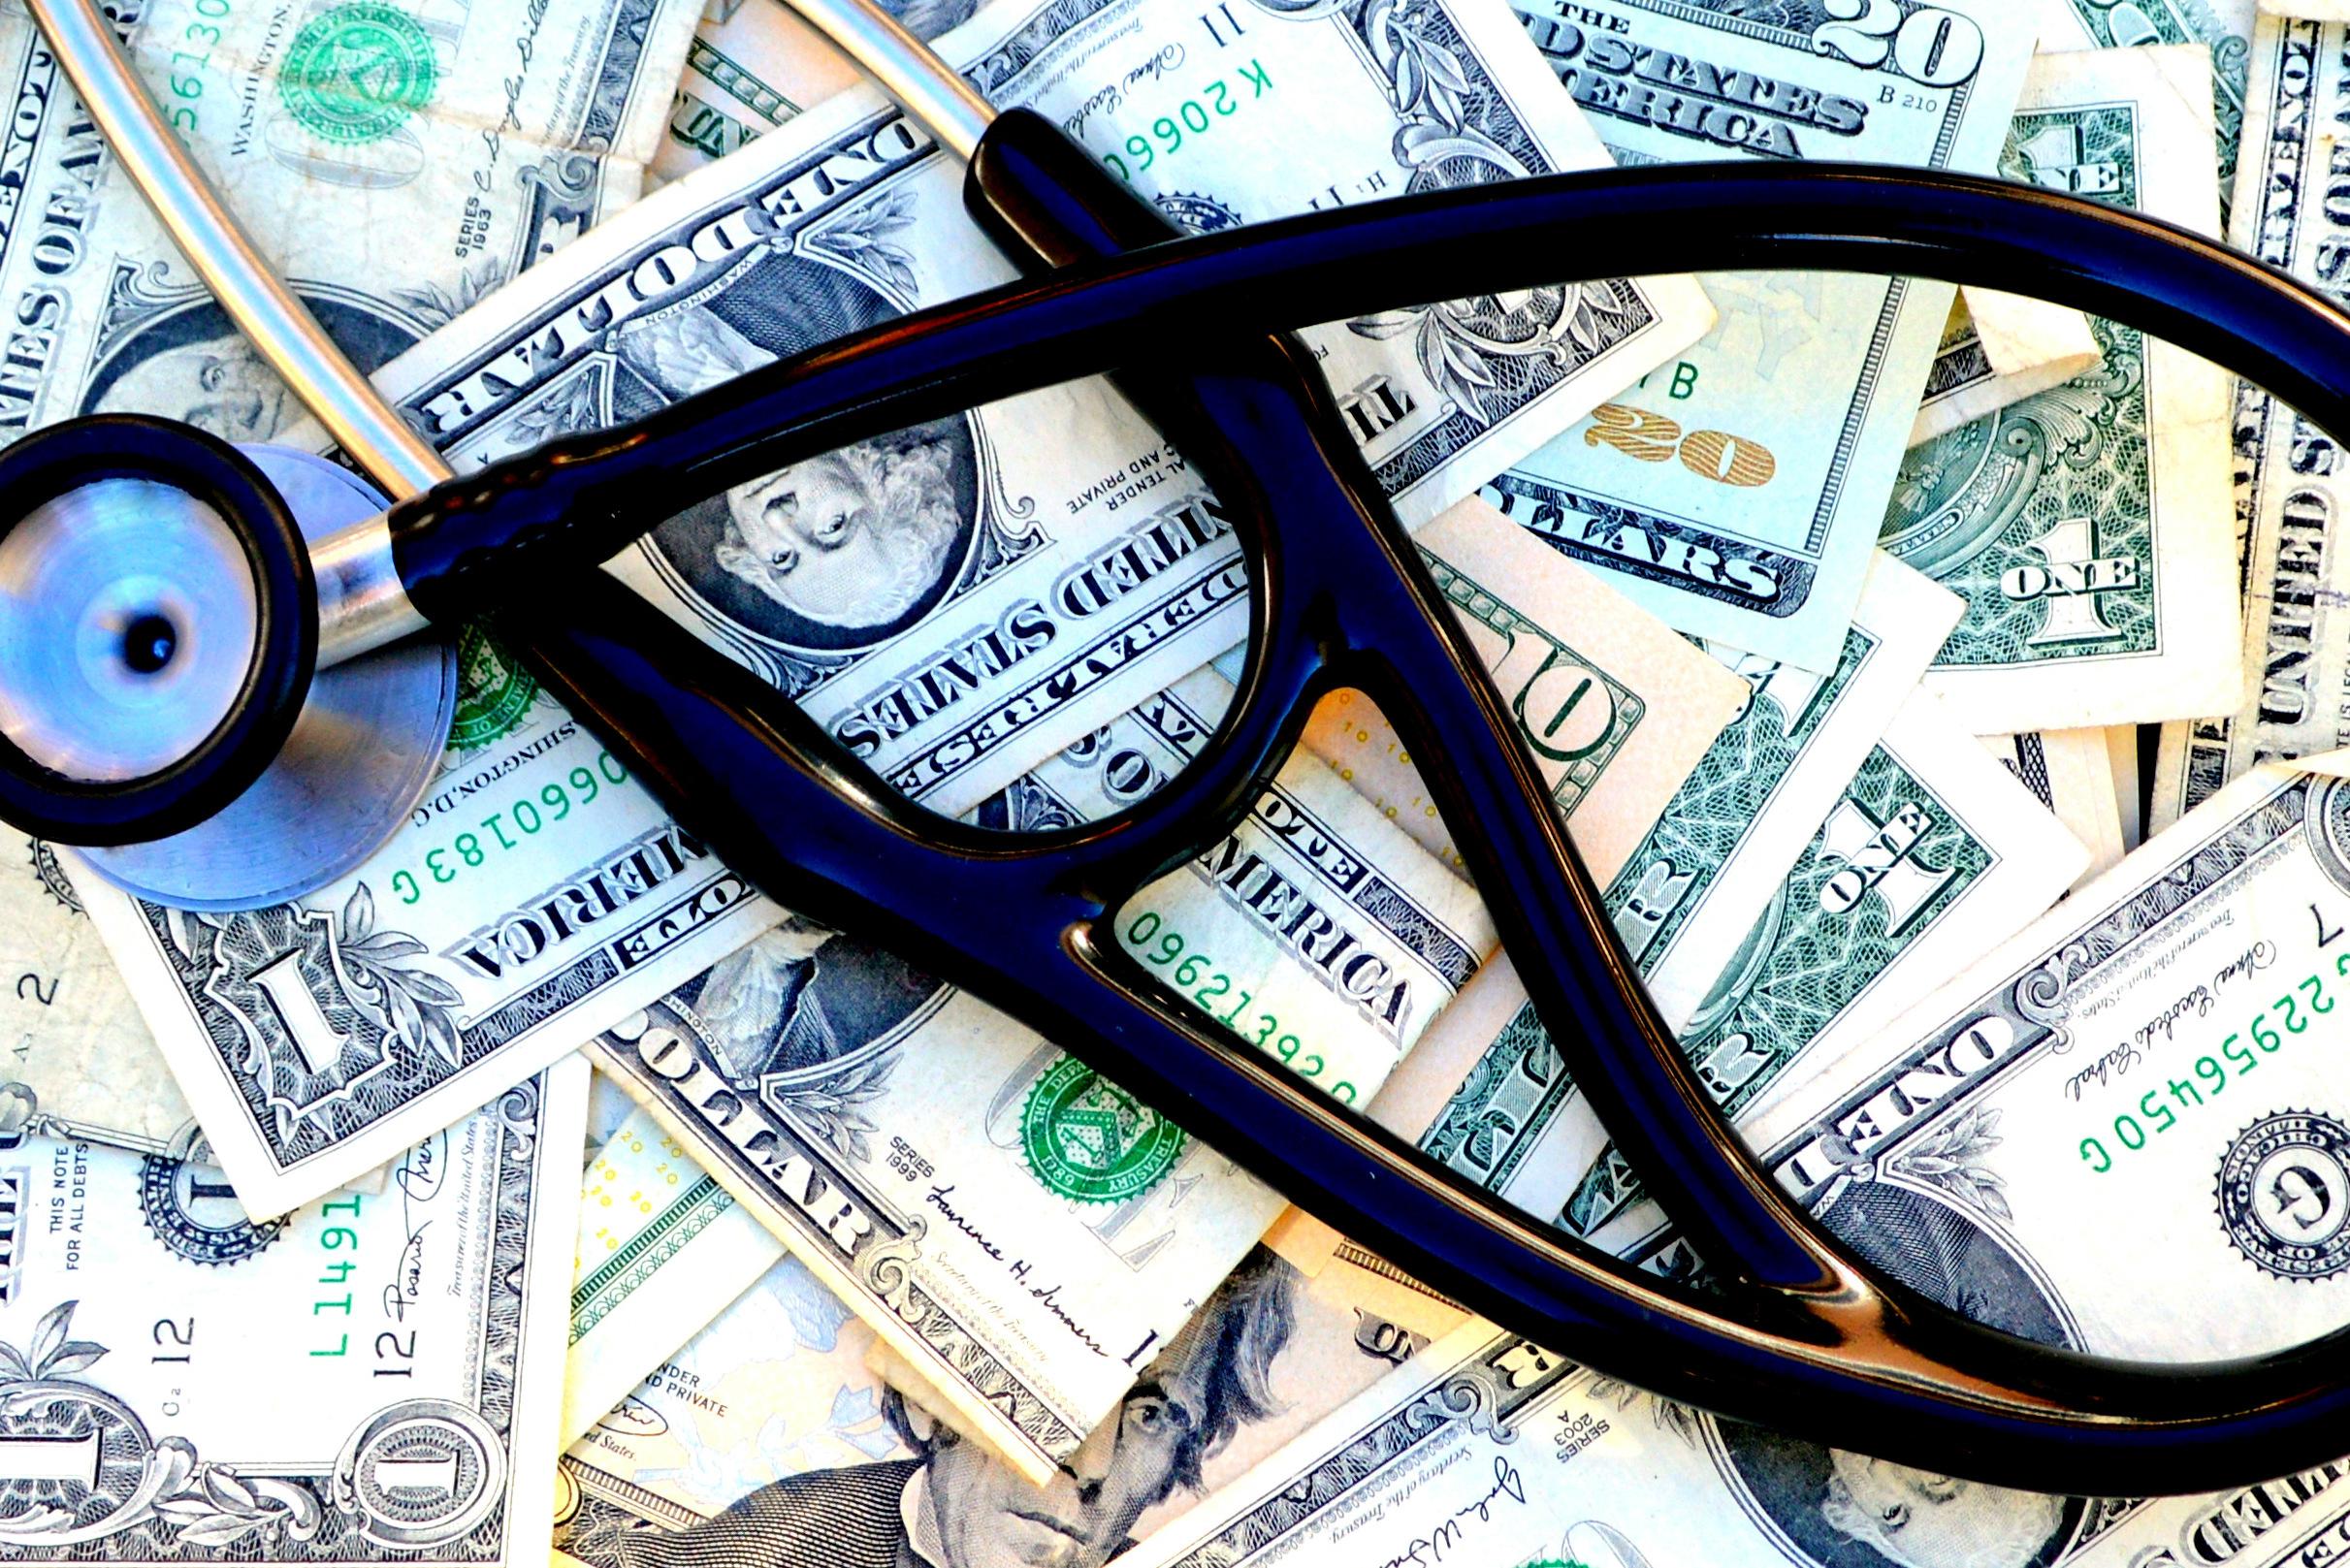 Dark blue stethoscope on top of dollar bills